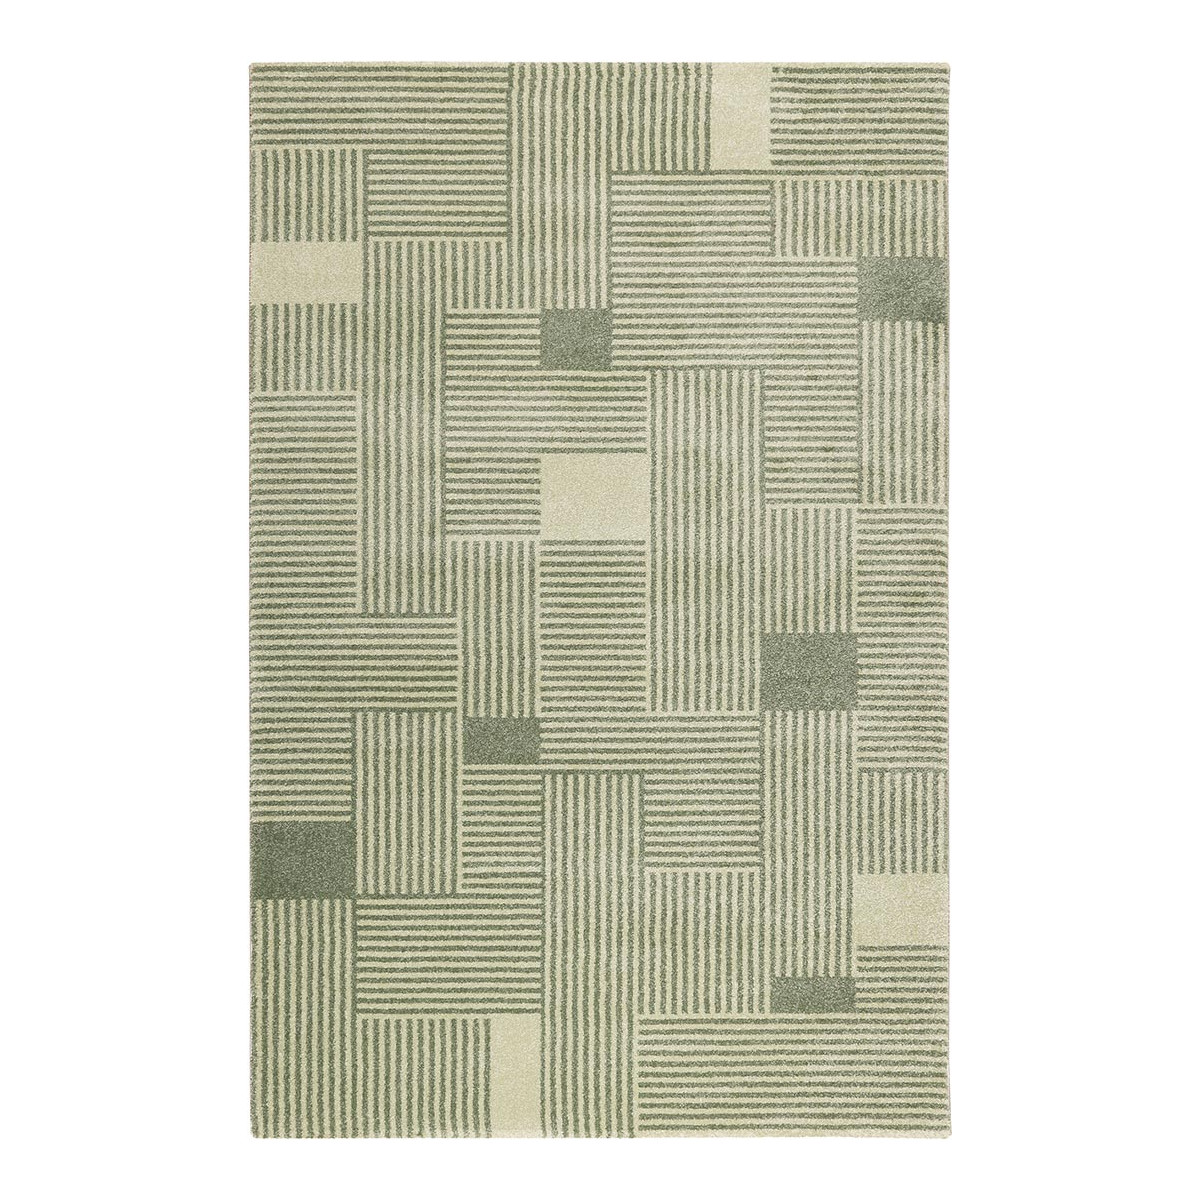 Tapis géométrique design en polypropylène vert 80x150